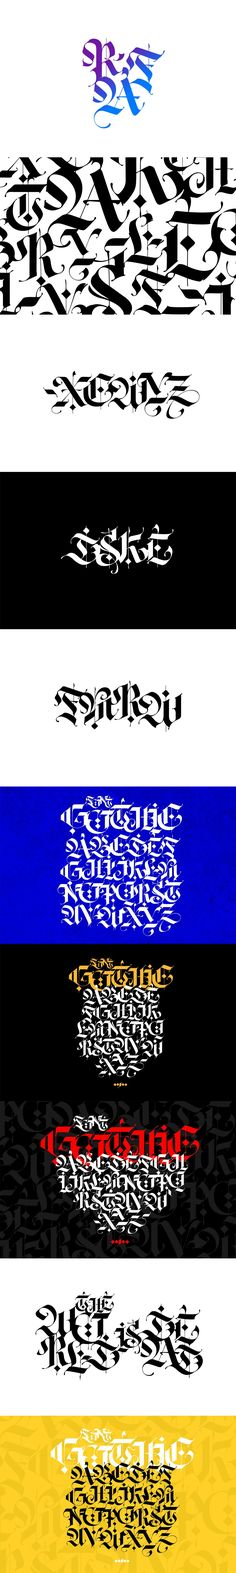 - Web & Graphic Design on SVG Ninja Gothic Fonts, Tattoo Lettering Fonts, English Alphabet, Handmade Design, Ninja, Letters, Graphic Design, Modern, Trendy Tree